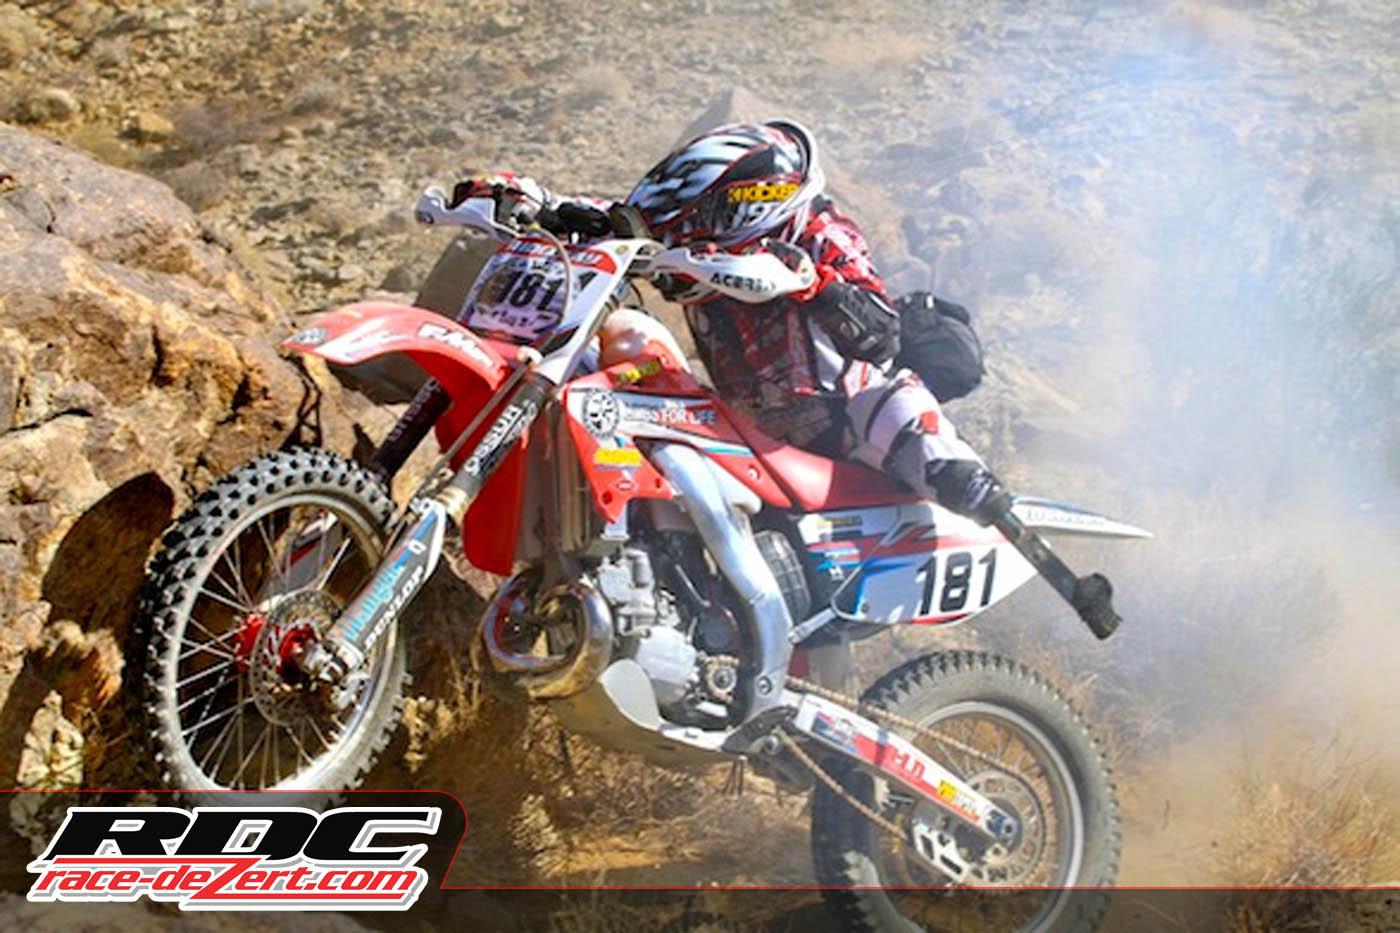 Amputee racer Chris Ridgeway hucks his HONDA up the rocky hill climb